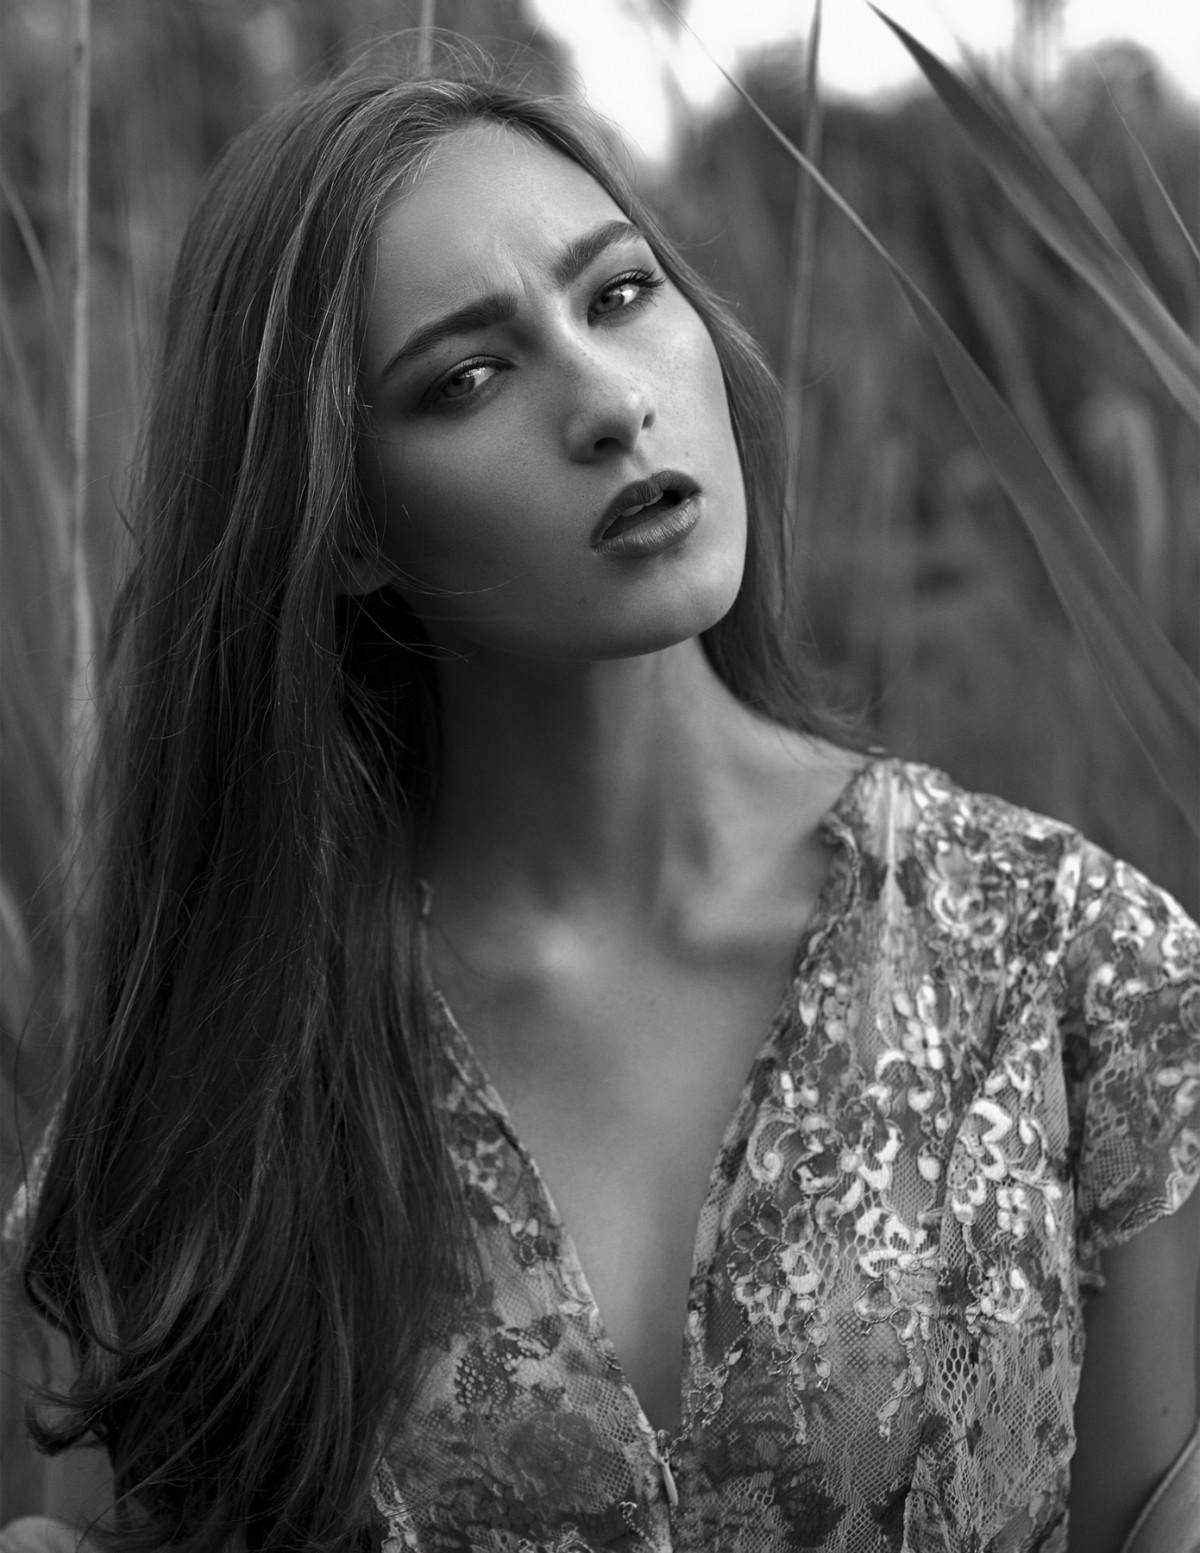 EMILIE TOURNEVACHE